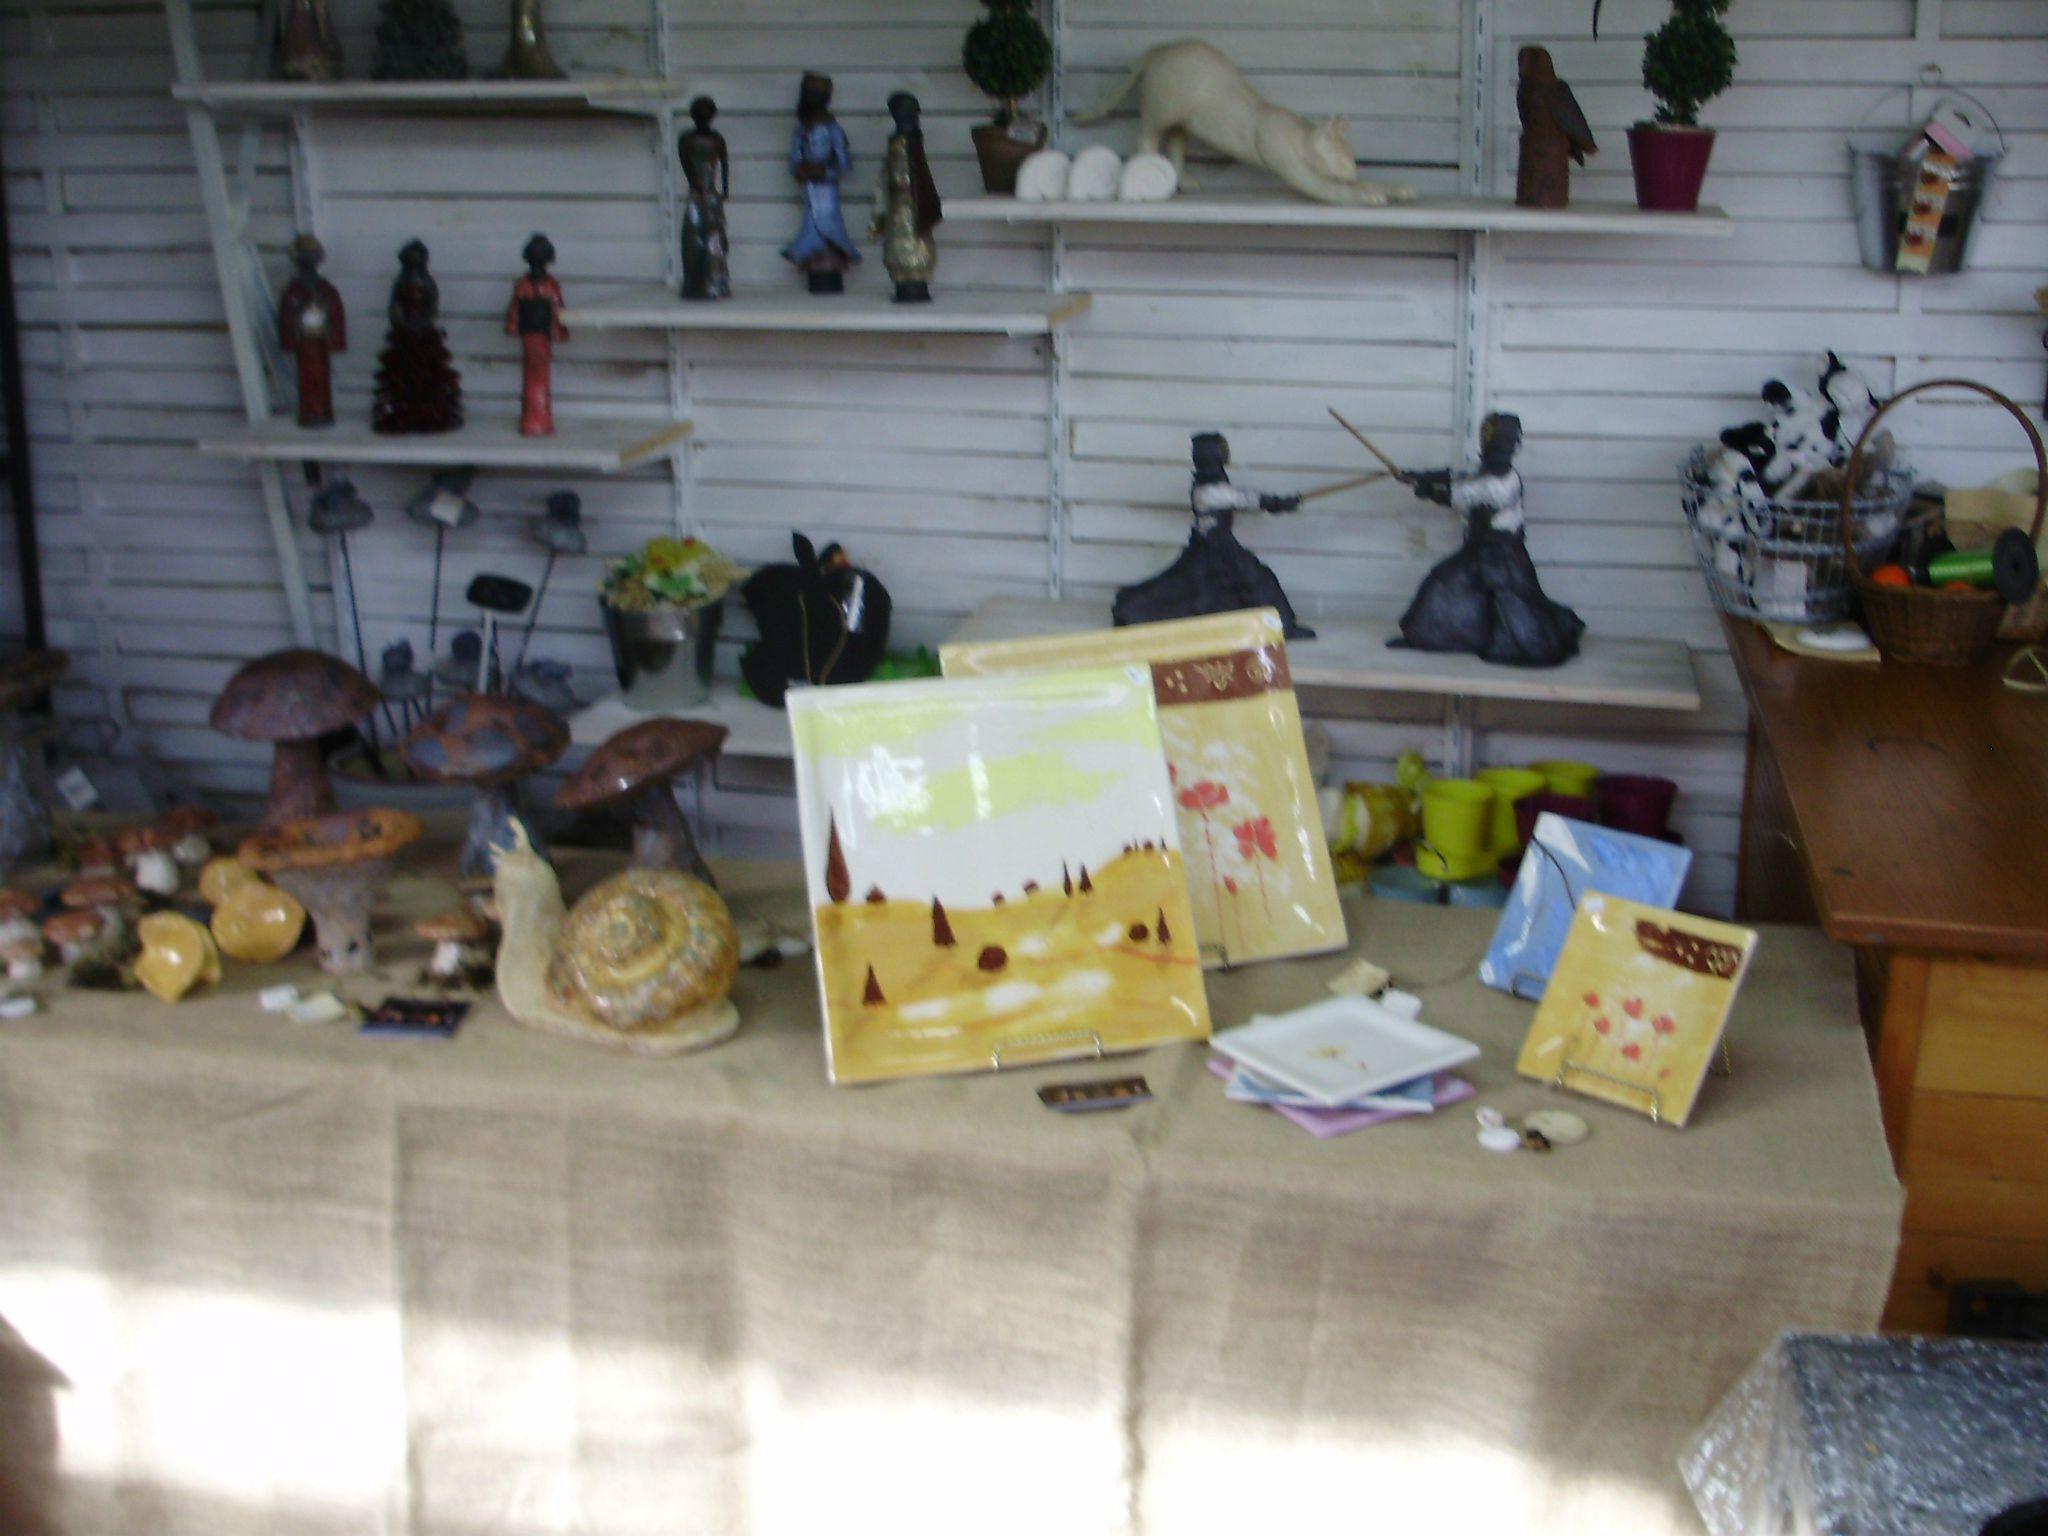 Design deco jardin tournai expo 1227 deco mariage vintage deco anniversaire 30 ans deco - Deco jardin tournai nice ...